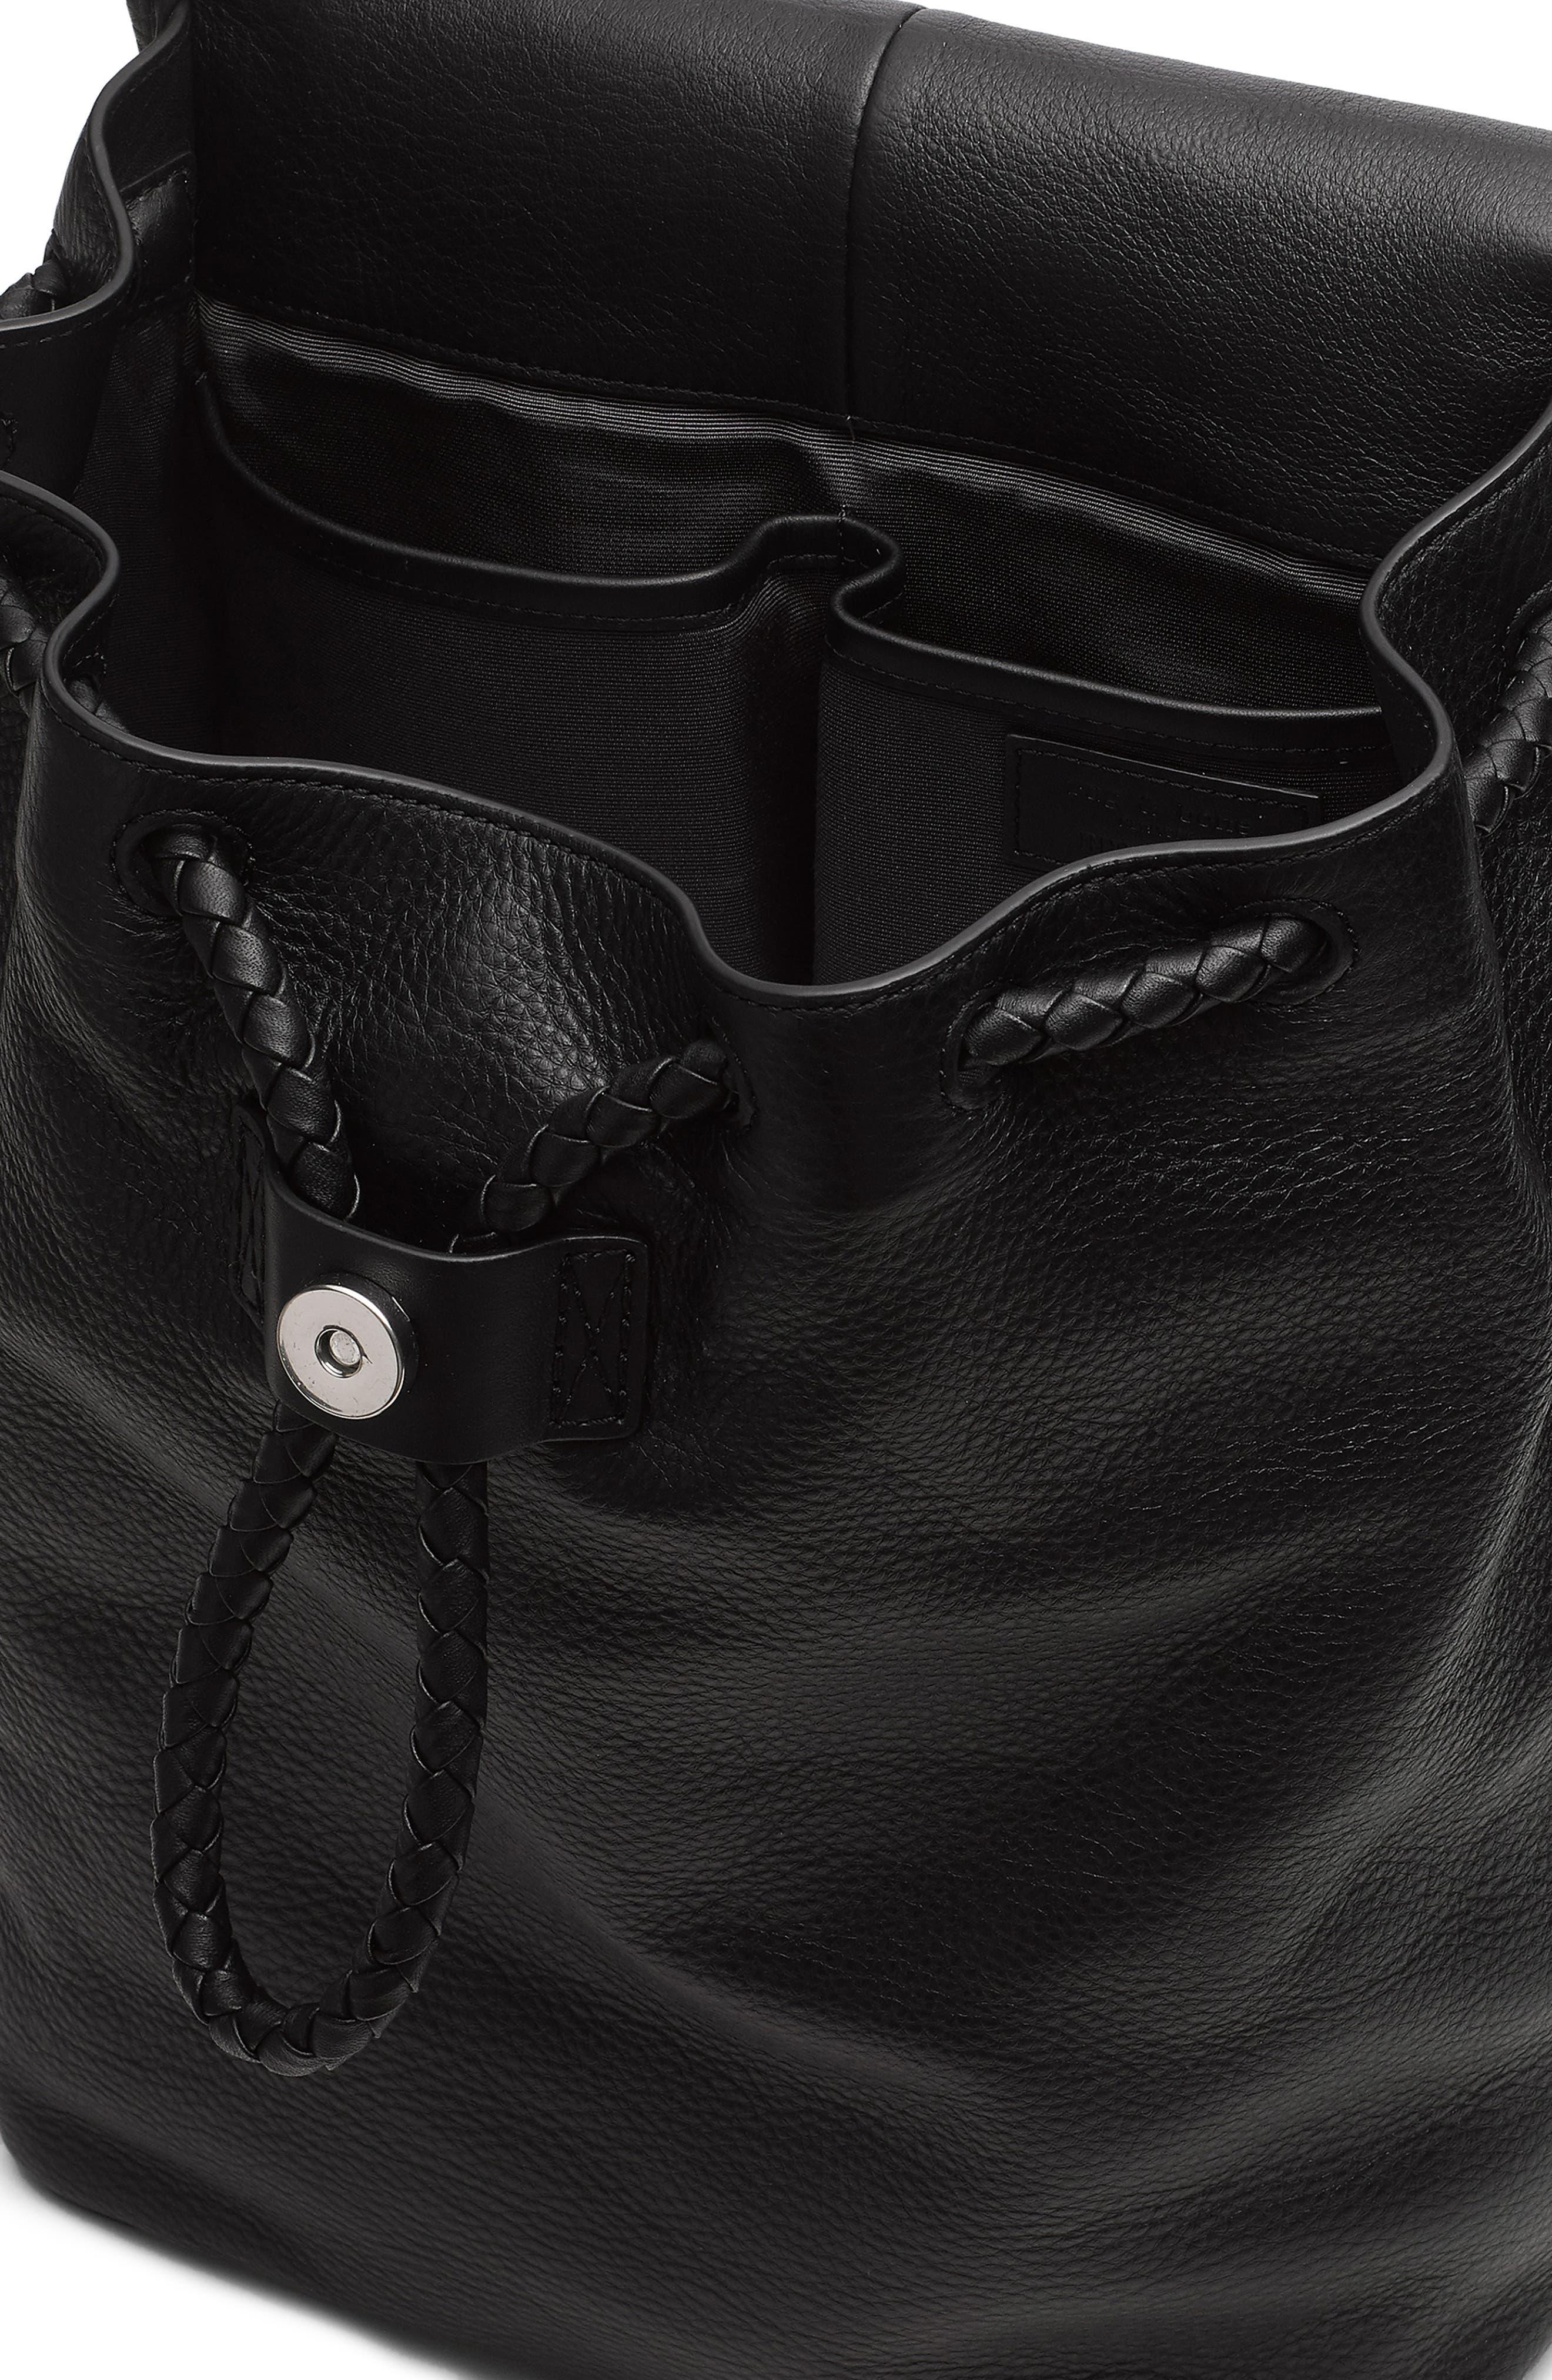 RAG & BONE,                             Loner Leather Backpack,                             Alternate thumbnail 4, color,                             BLACK